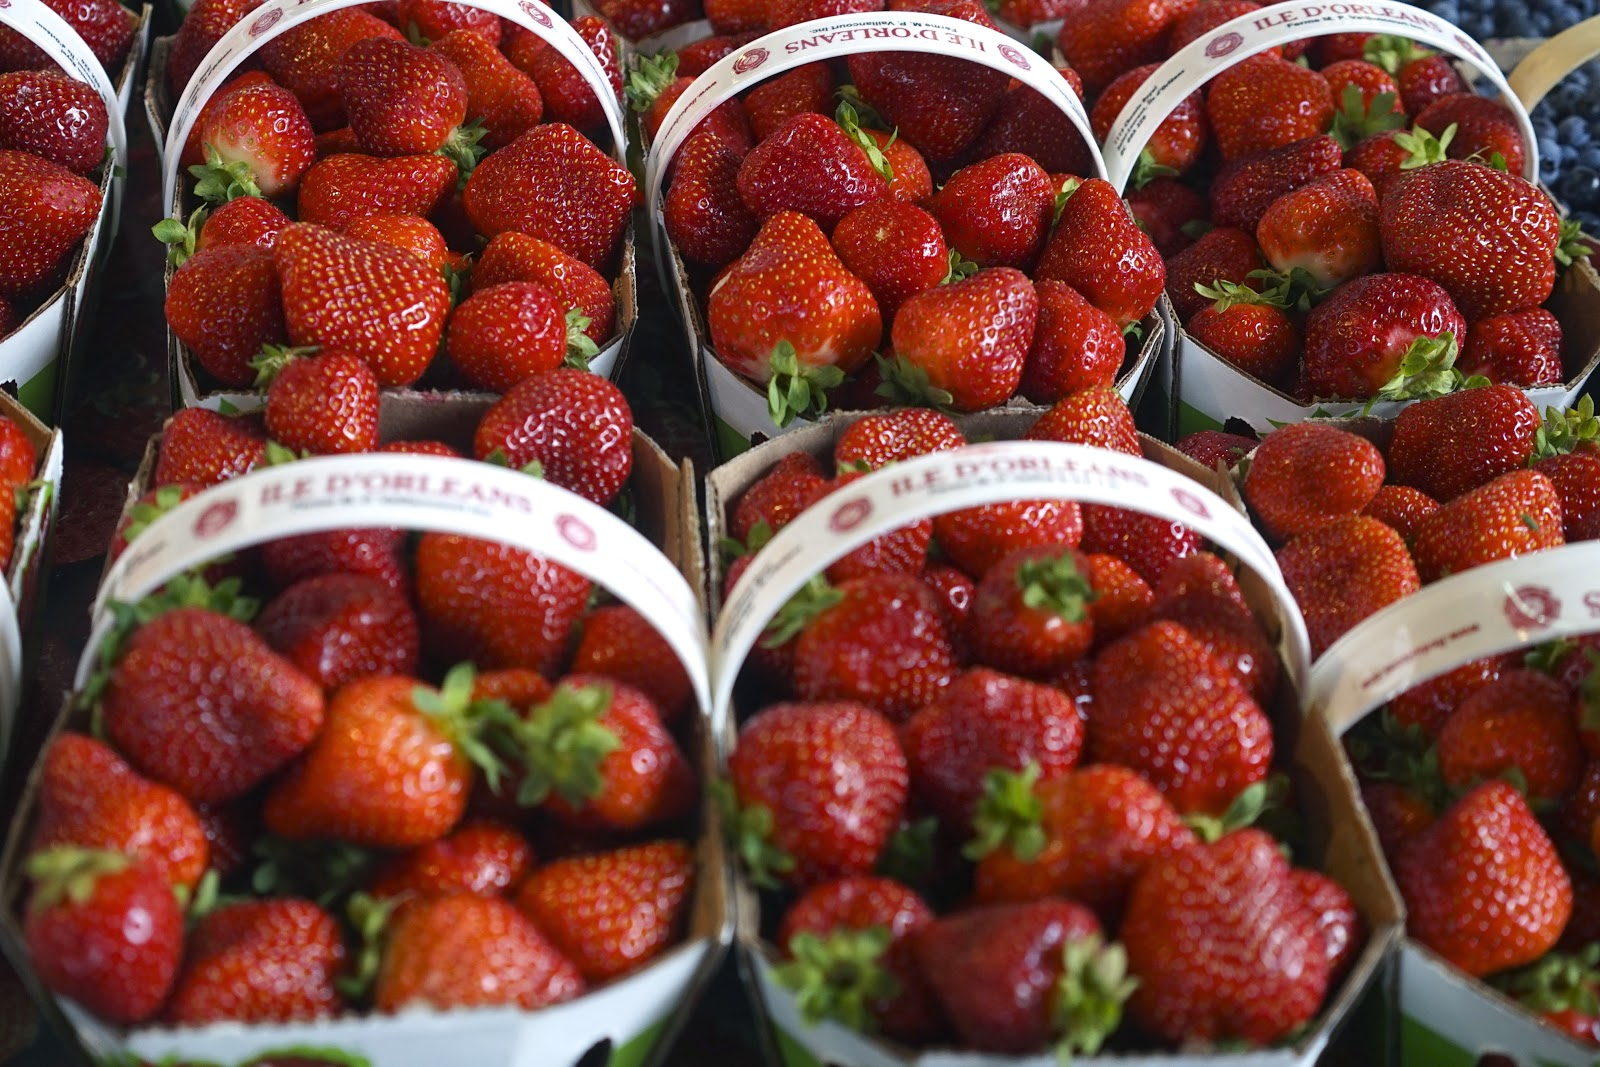 jean talon market strawberries